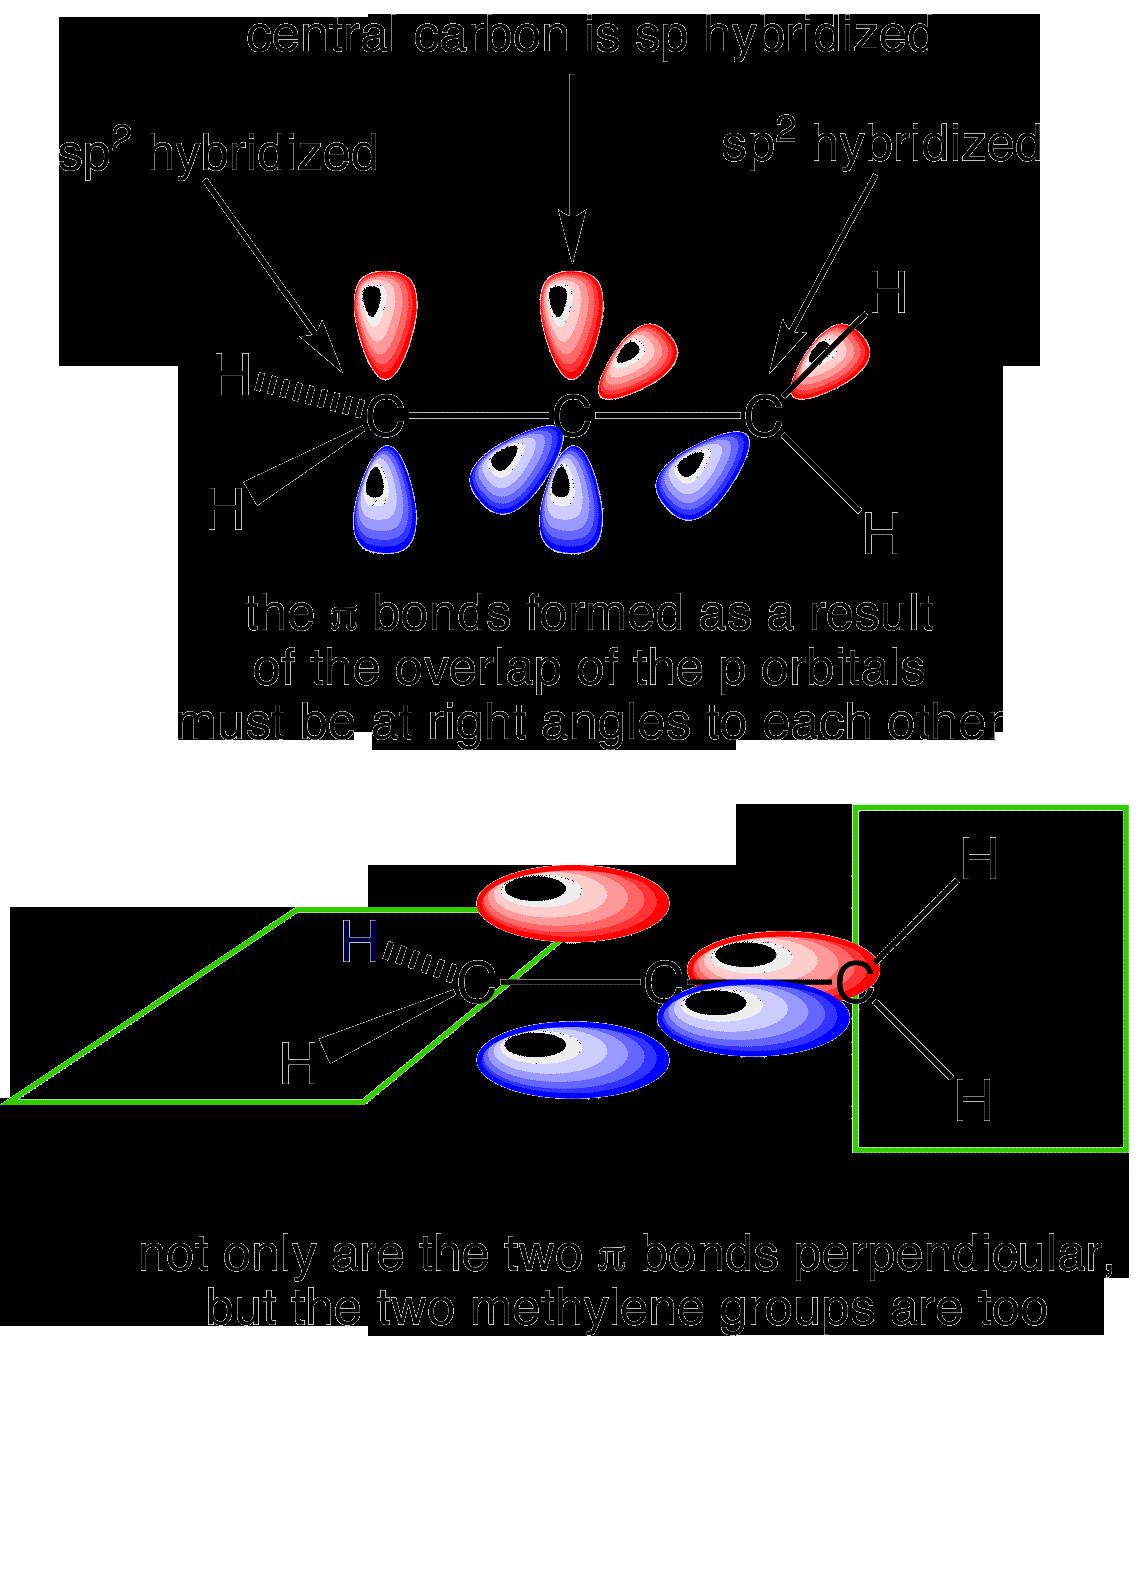 Bonding Orbitals In Allene